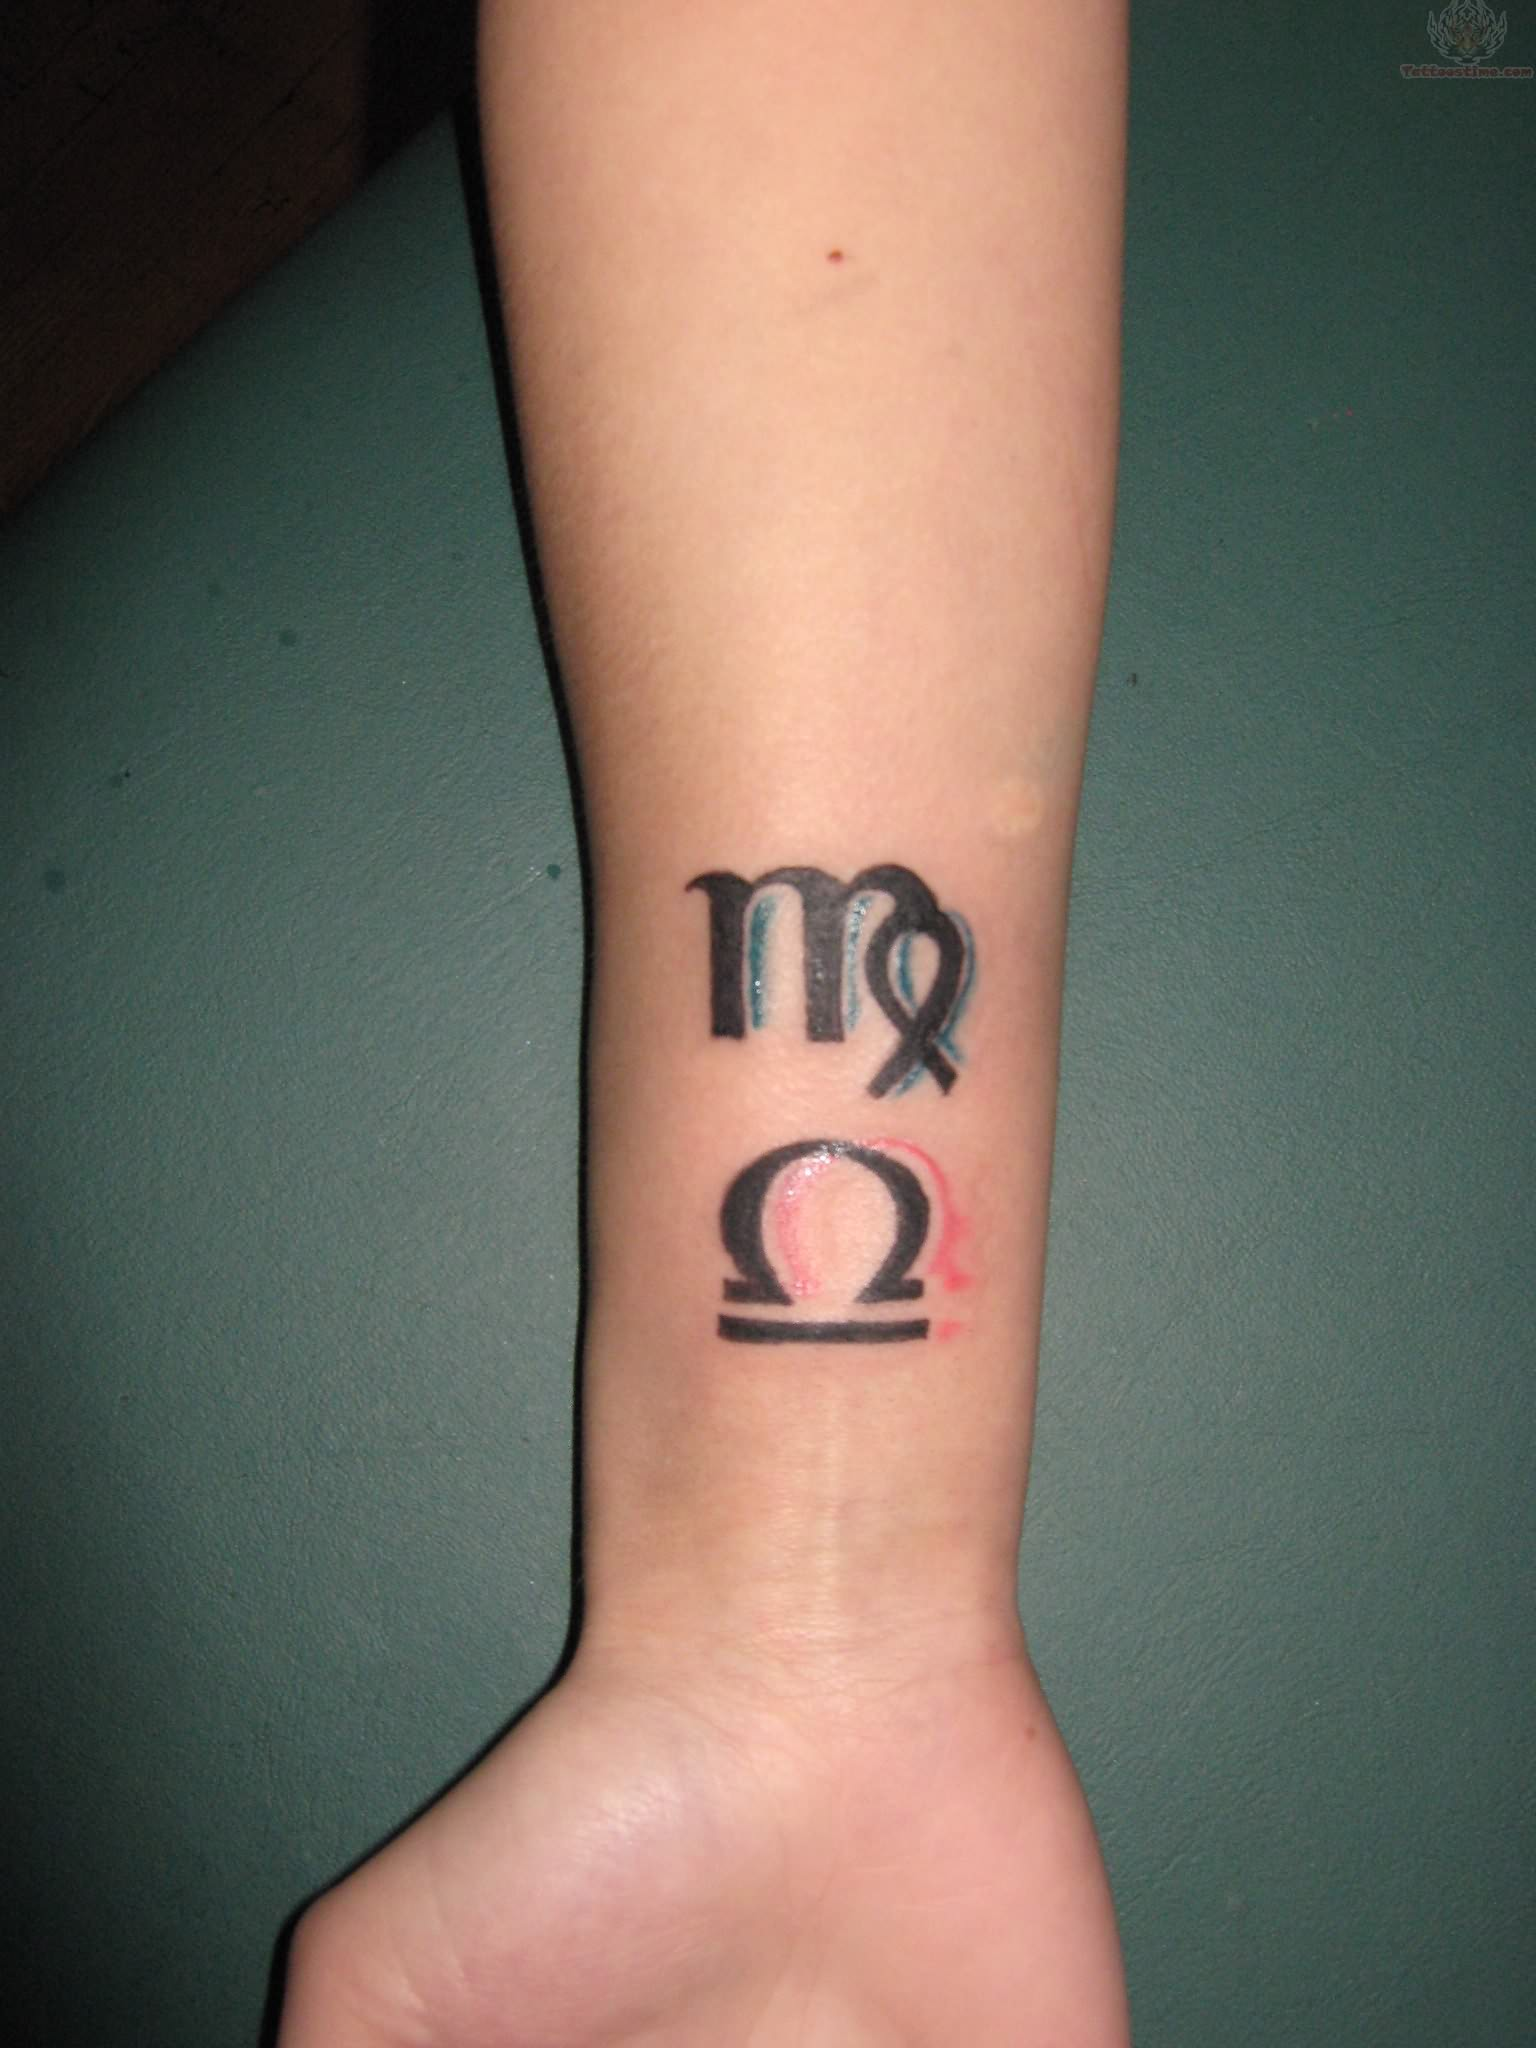 Virgo Sign Tattoo Designs